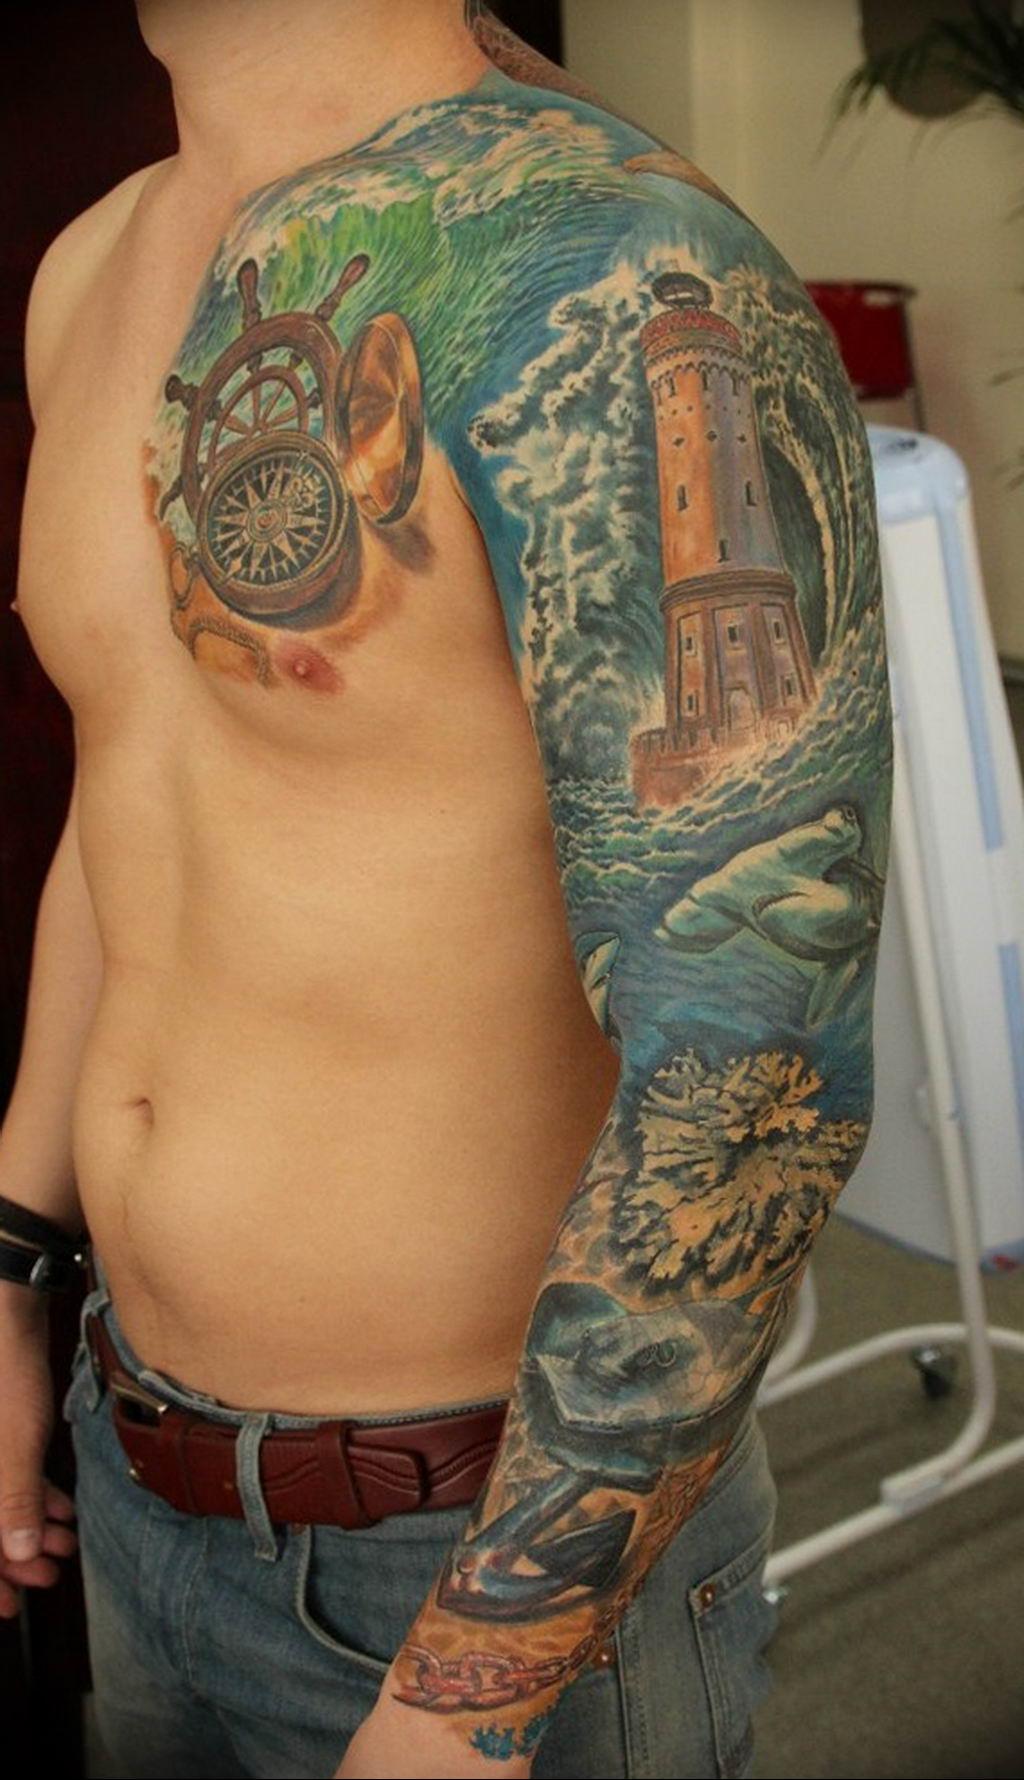 Фото пример тату океан 13.08.2019 №008 - ocean tattoo - tatufoto.com